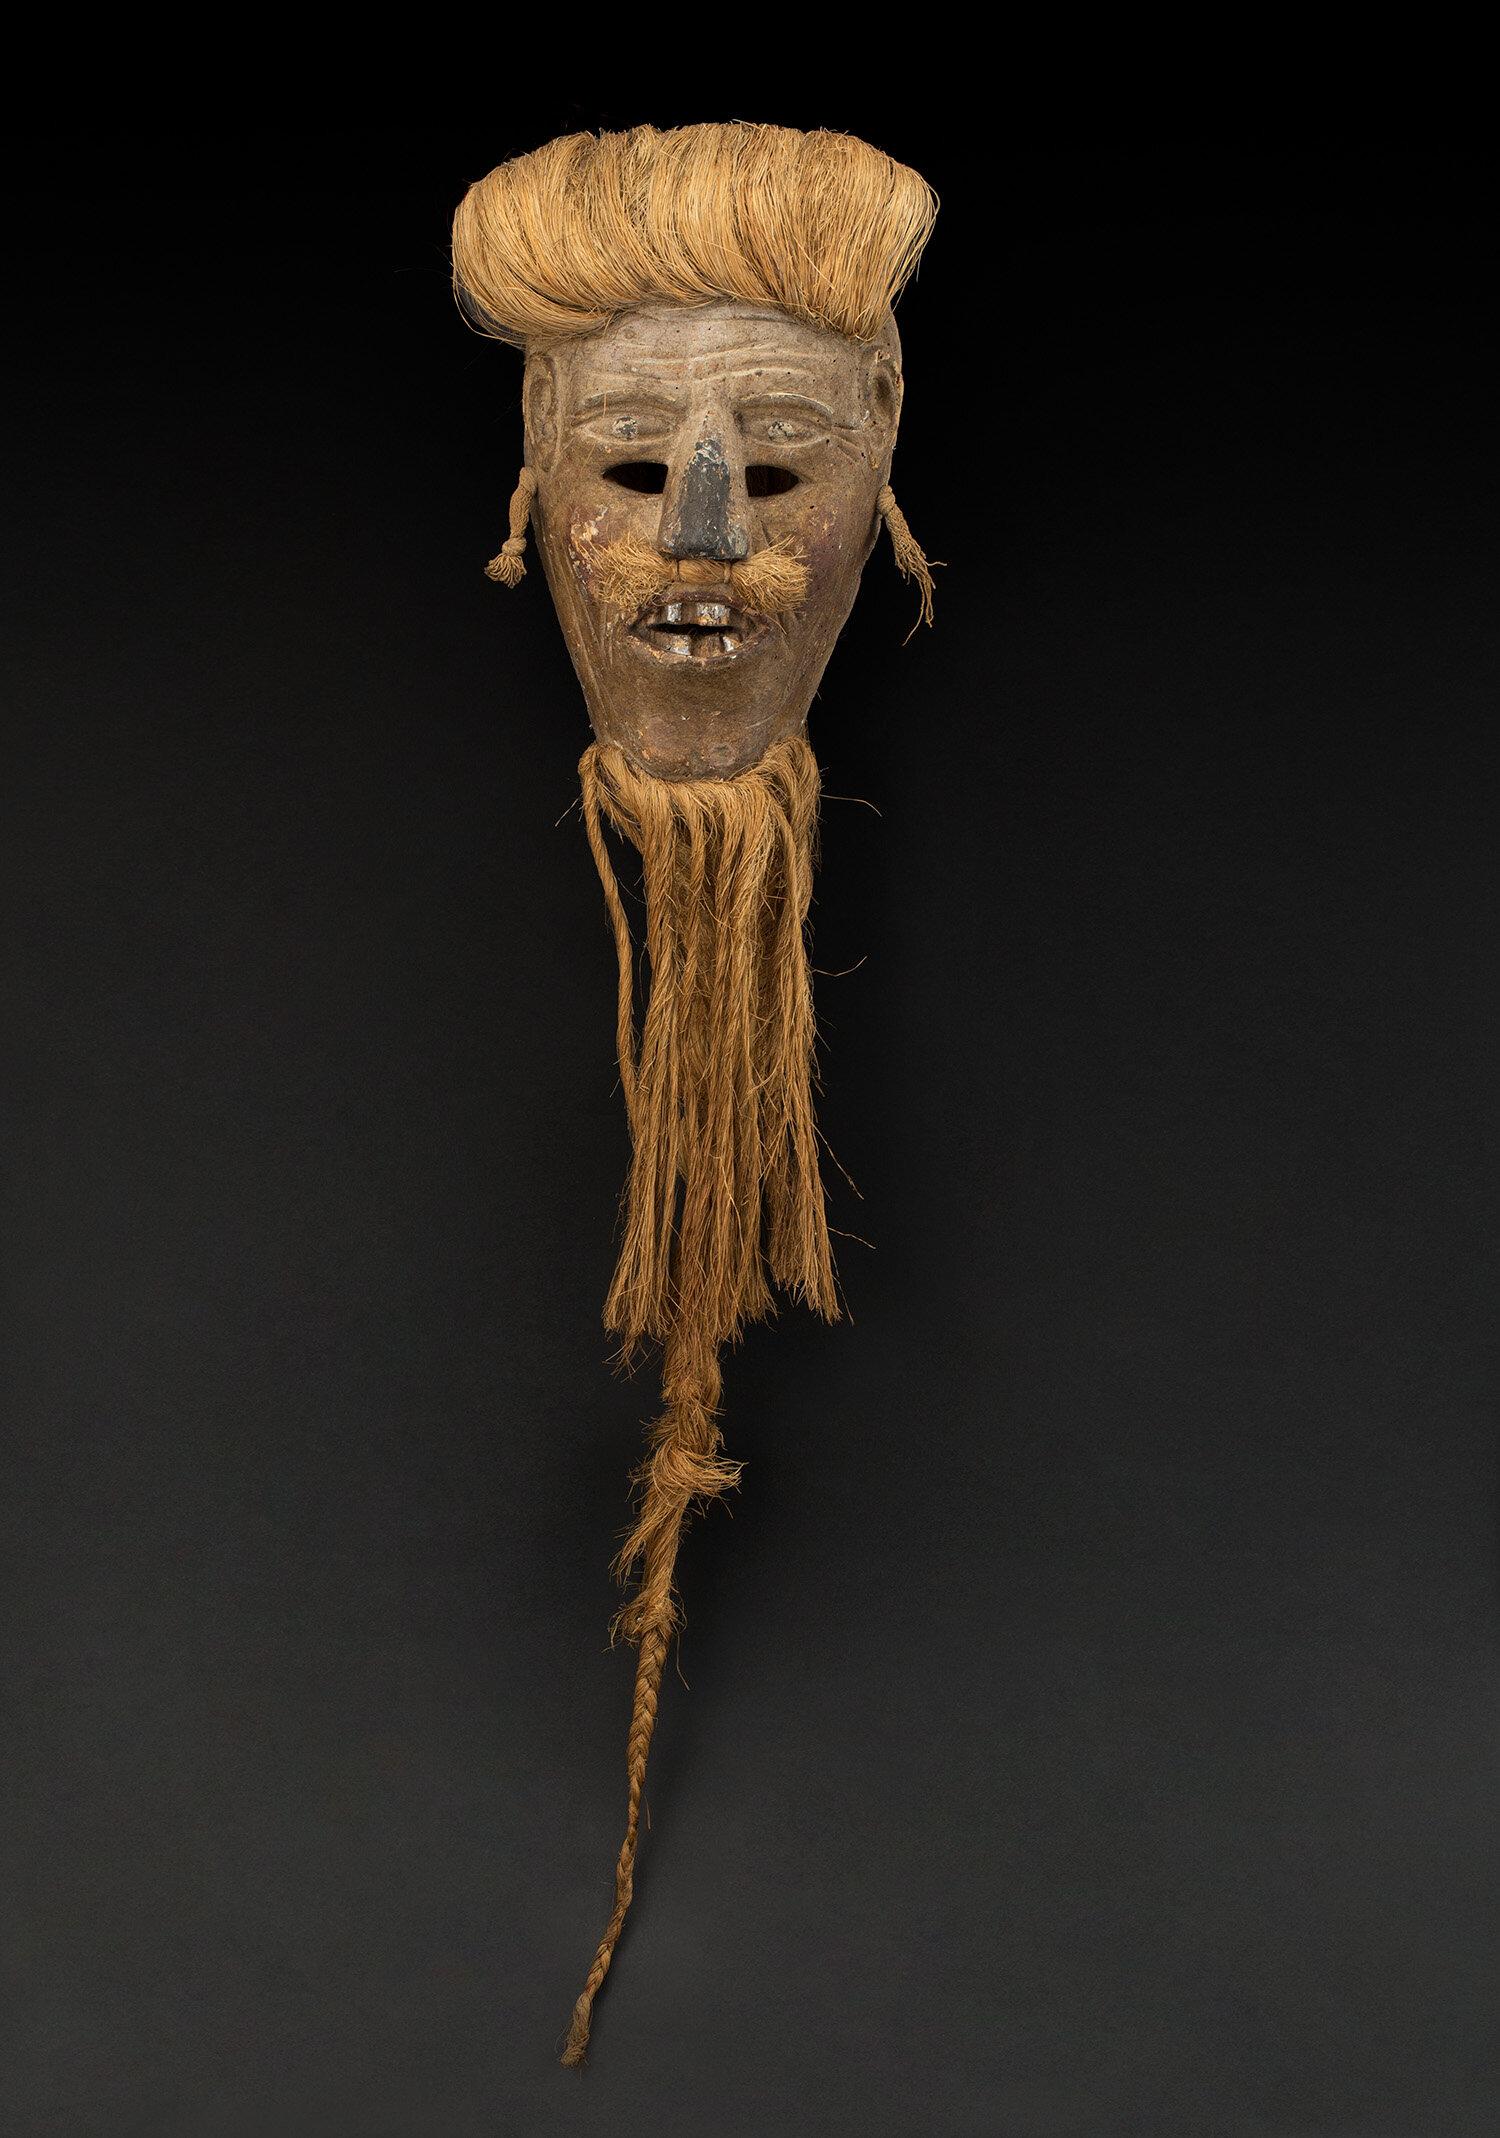 Masks  Tlaxcala Hermitano character, Pastorela dance  , mid 20th C. Polychrome wood, aluminum foil, sisal 36 x 9 x 5 inches 91.4 x 22.9 x 12.7 cm M 373